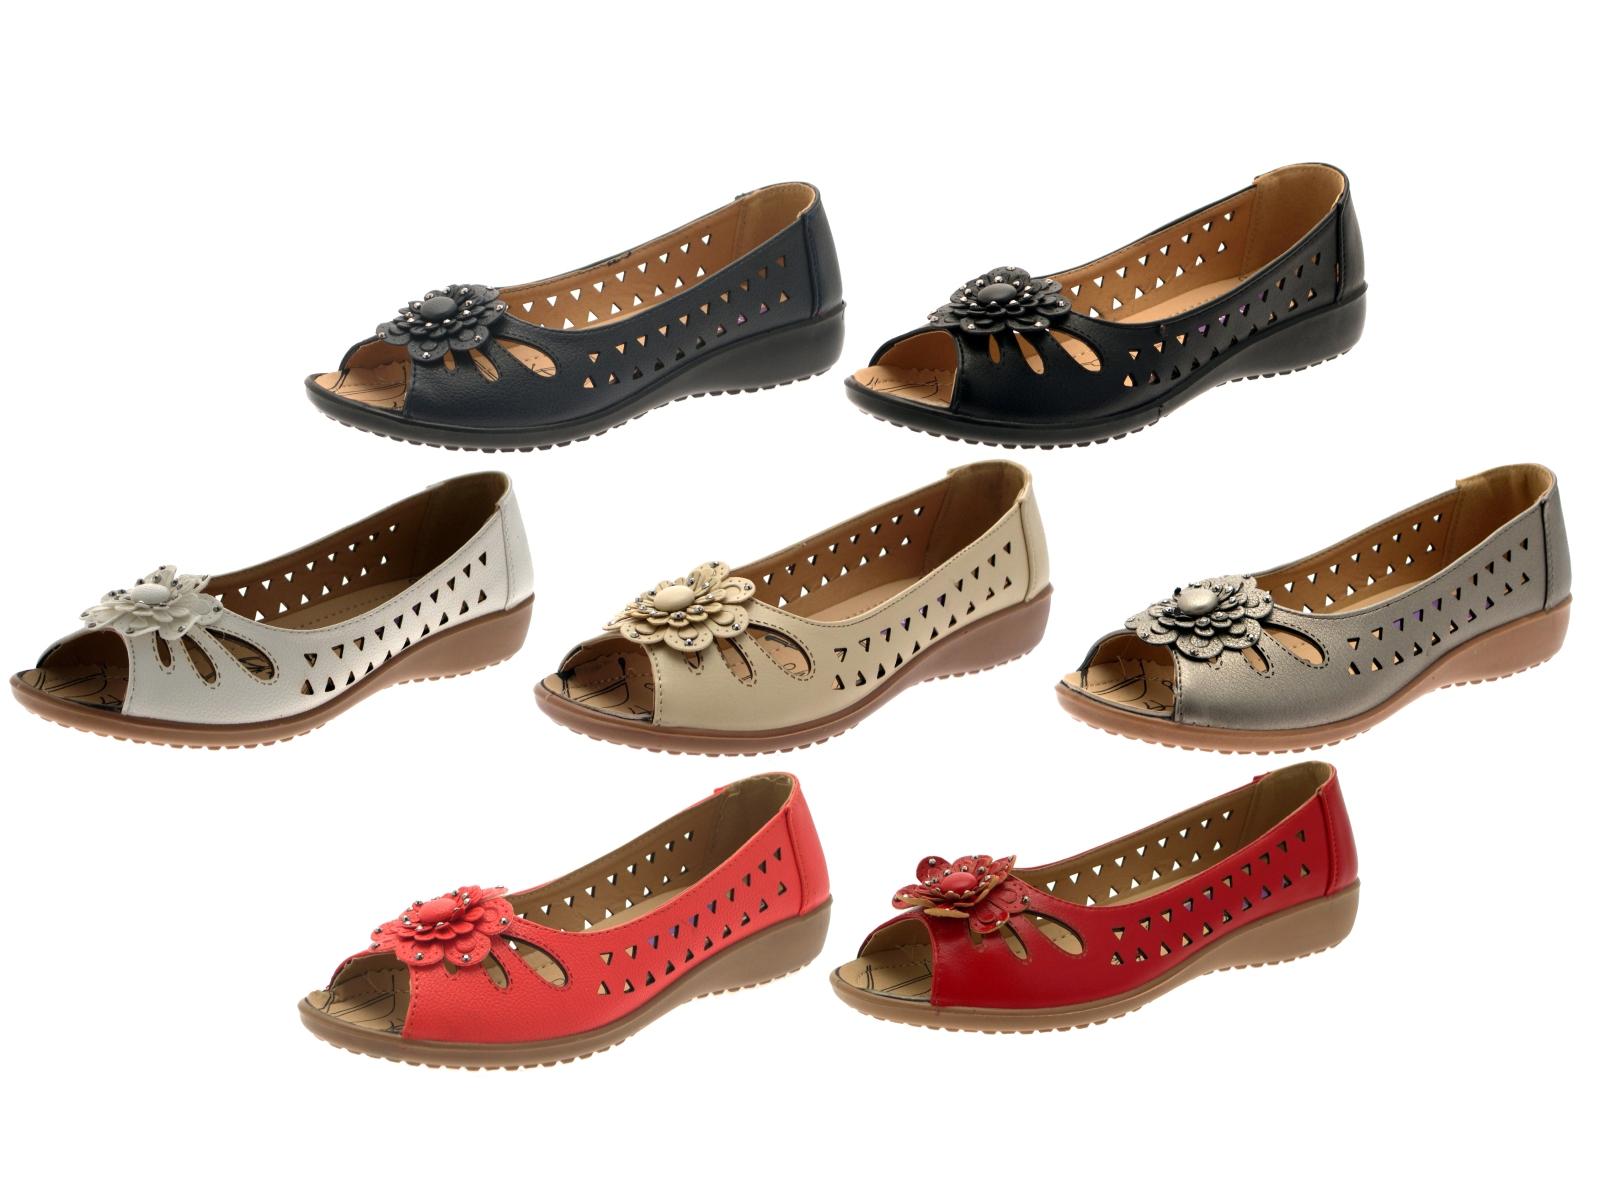 4b42c5a7eabac Womens Faux Leather Comfort Cut Out Flat Shoes Flower Sandals Ladies ...